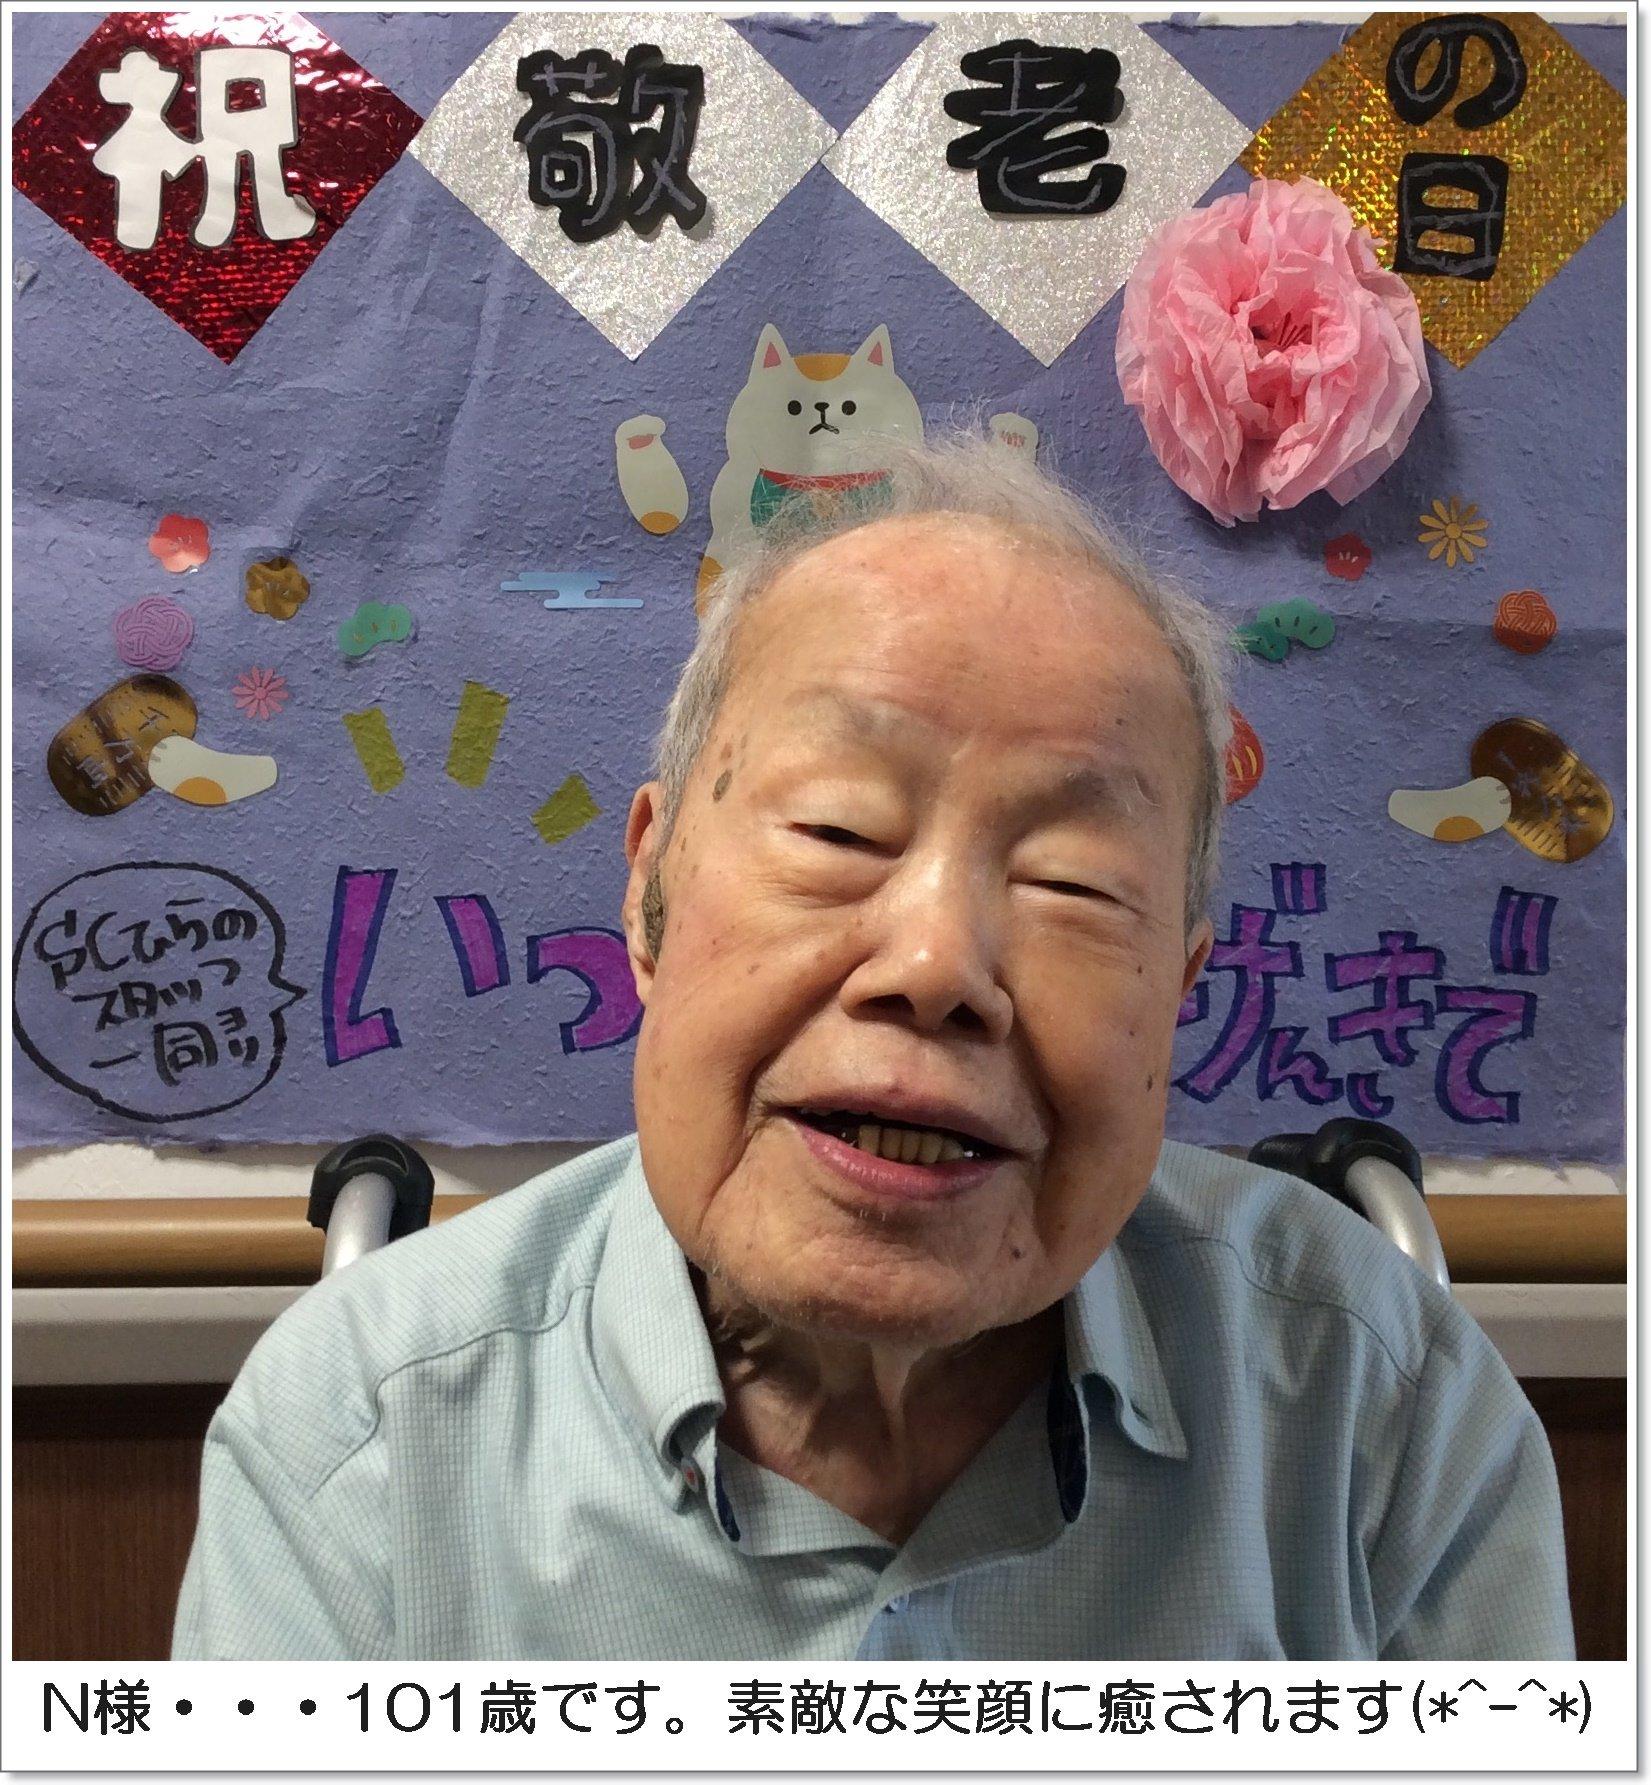 https://www.supercourt.jp/blog/hirano/IMG_2632-crop.JPG